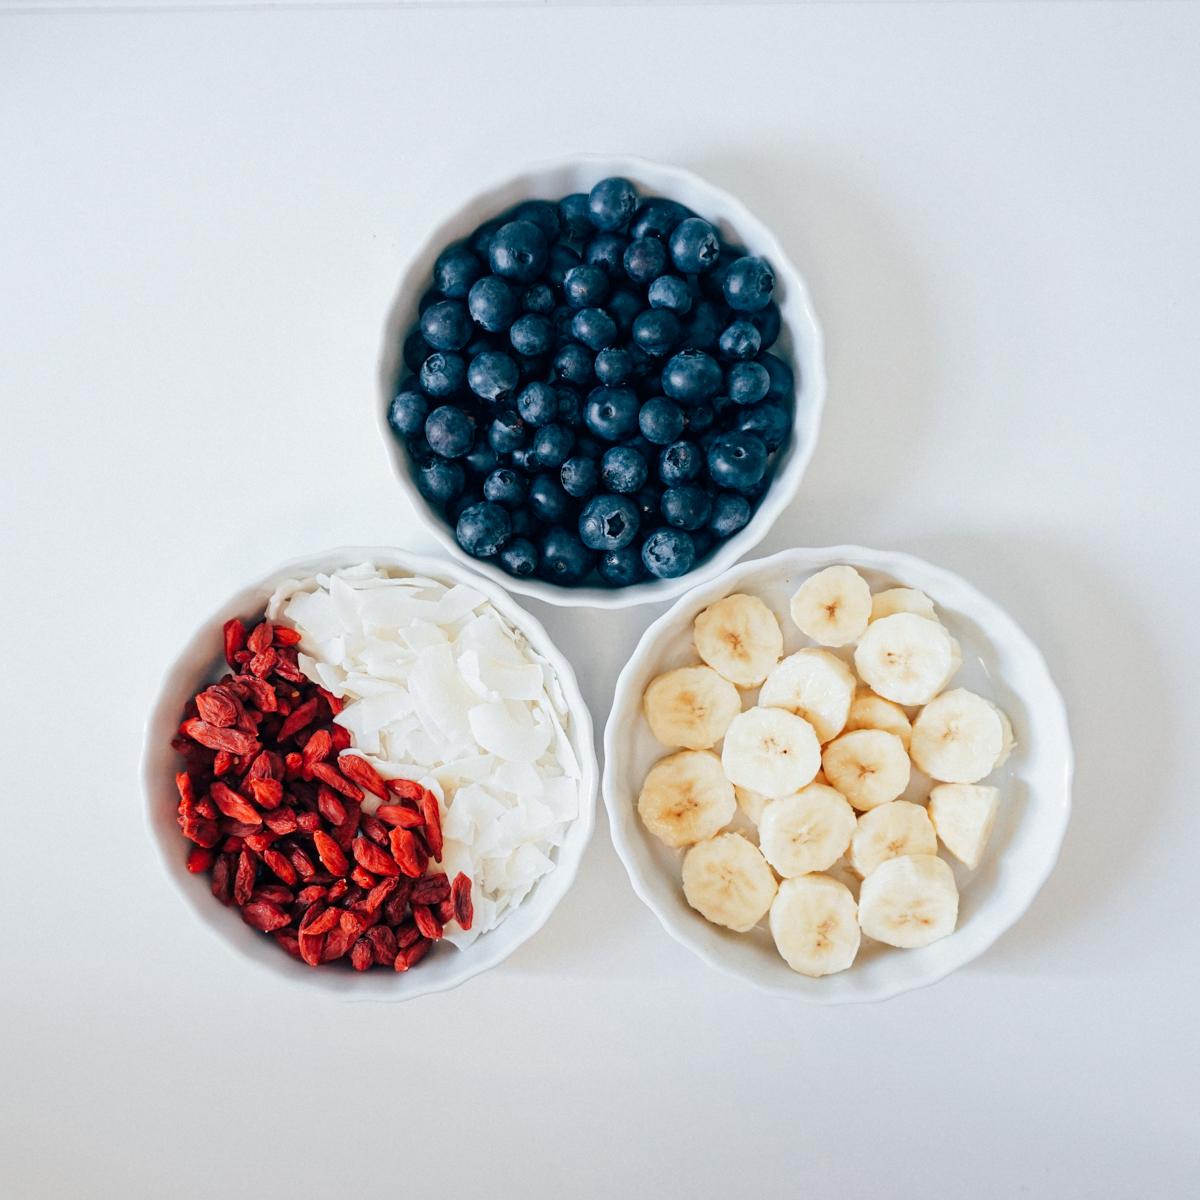 smoothie_bowl_ingredients